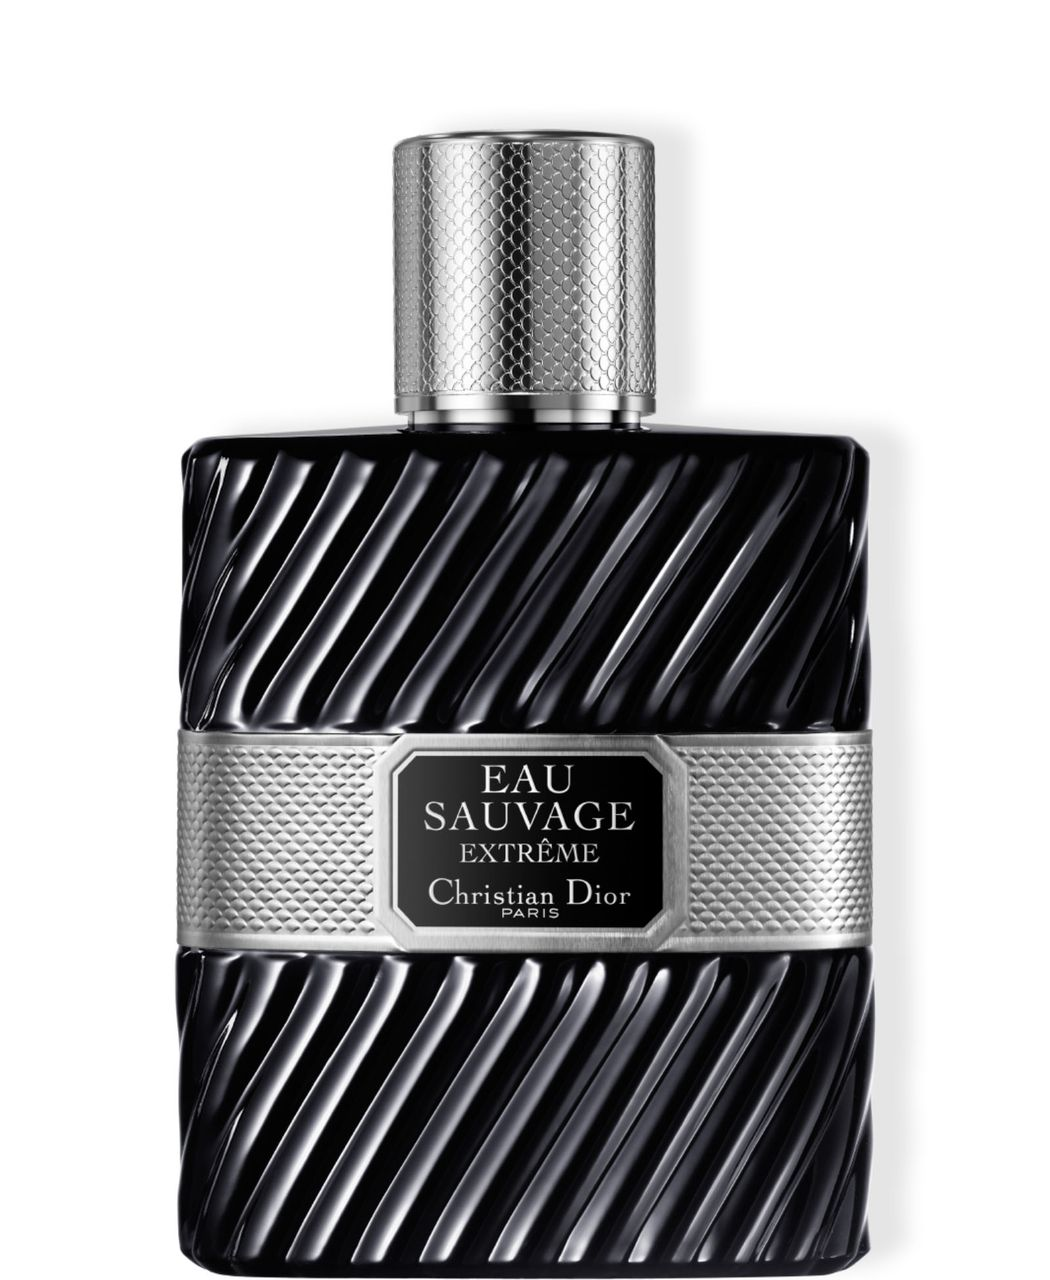 Dior EAU SAUVAGE EXTRÊME EAU DE TOILETTE SPRAY 20 ml F20 ...